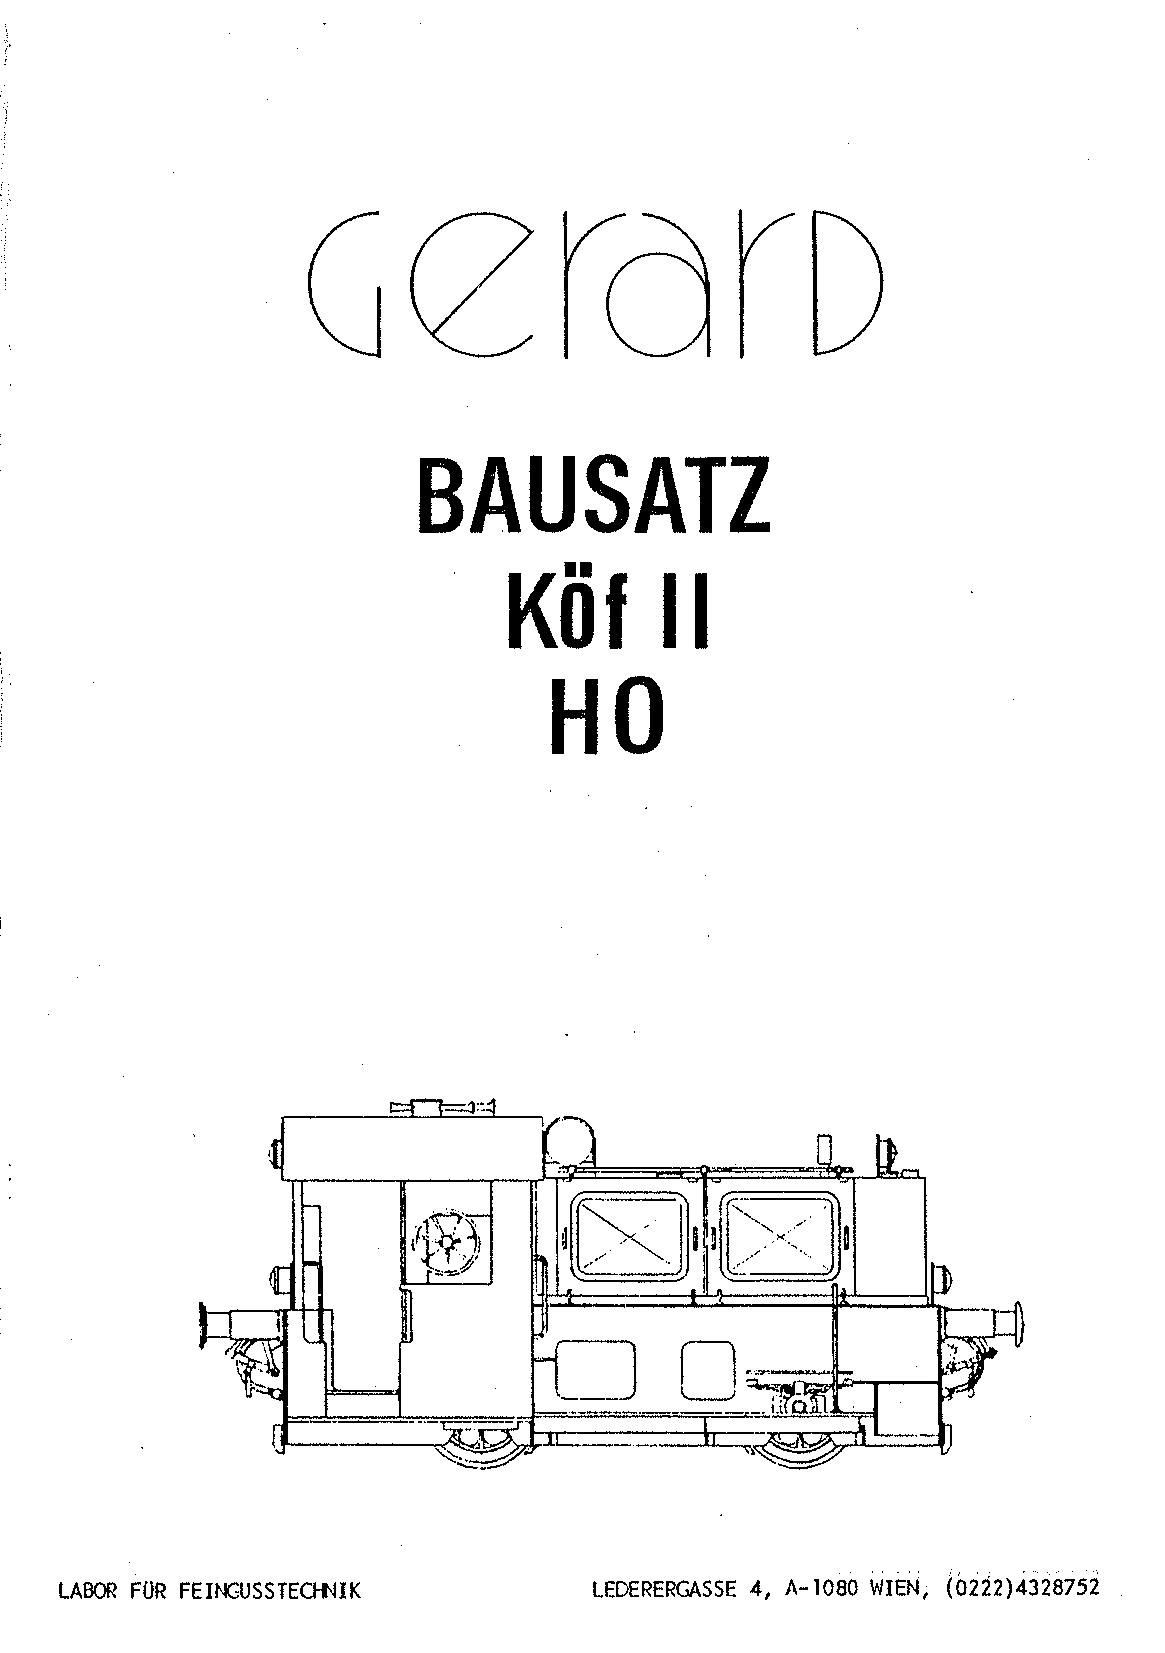 Bauanleitung Gerard Köf II 1/87 – Seite 1